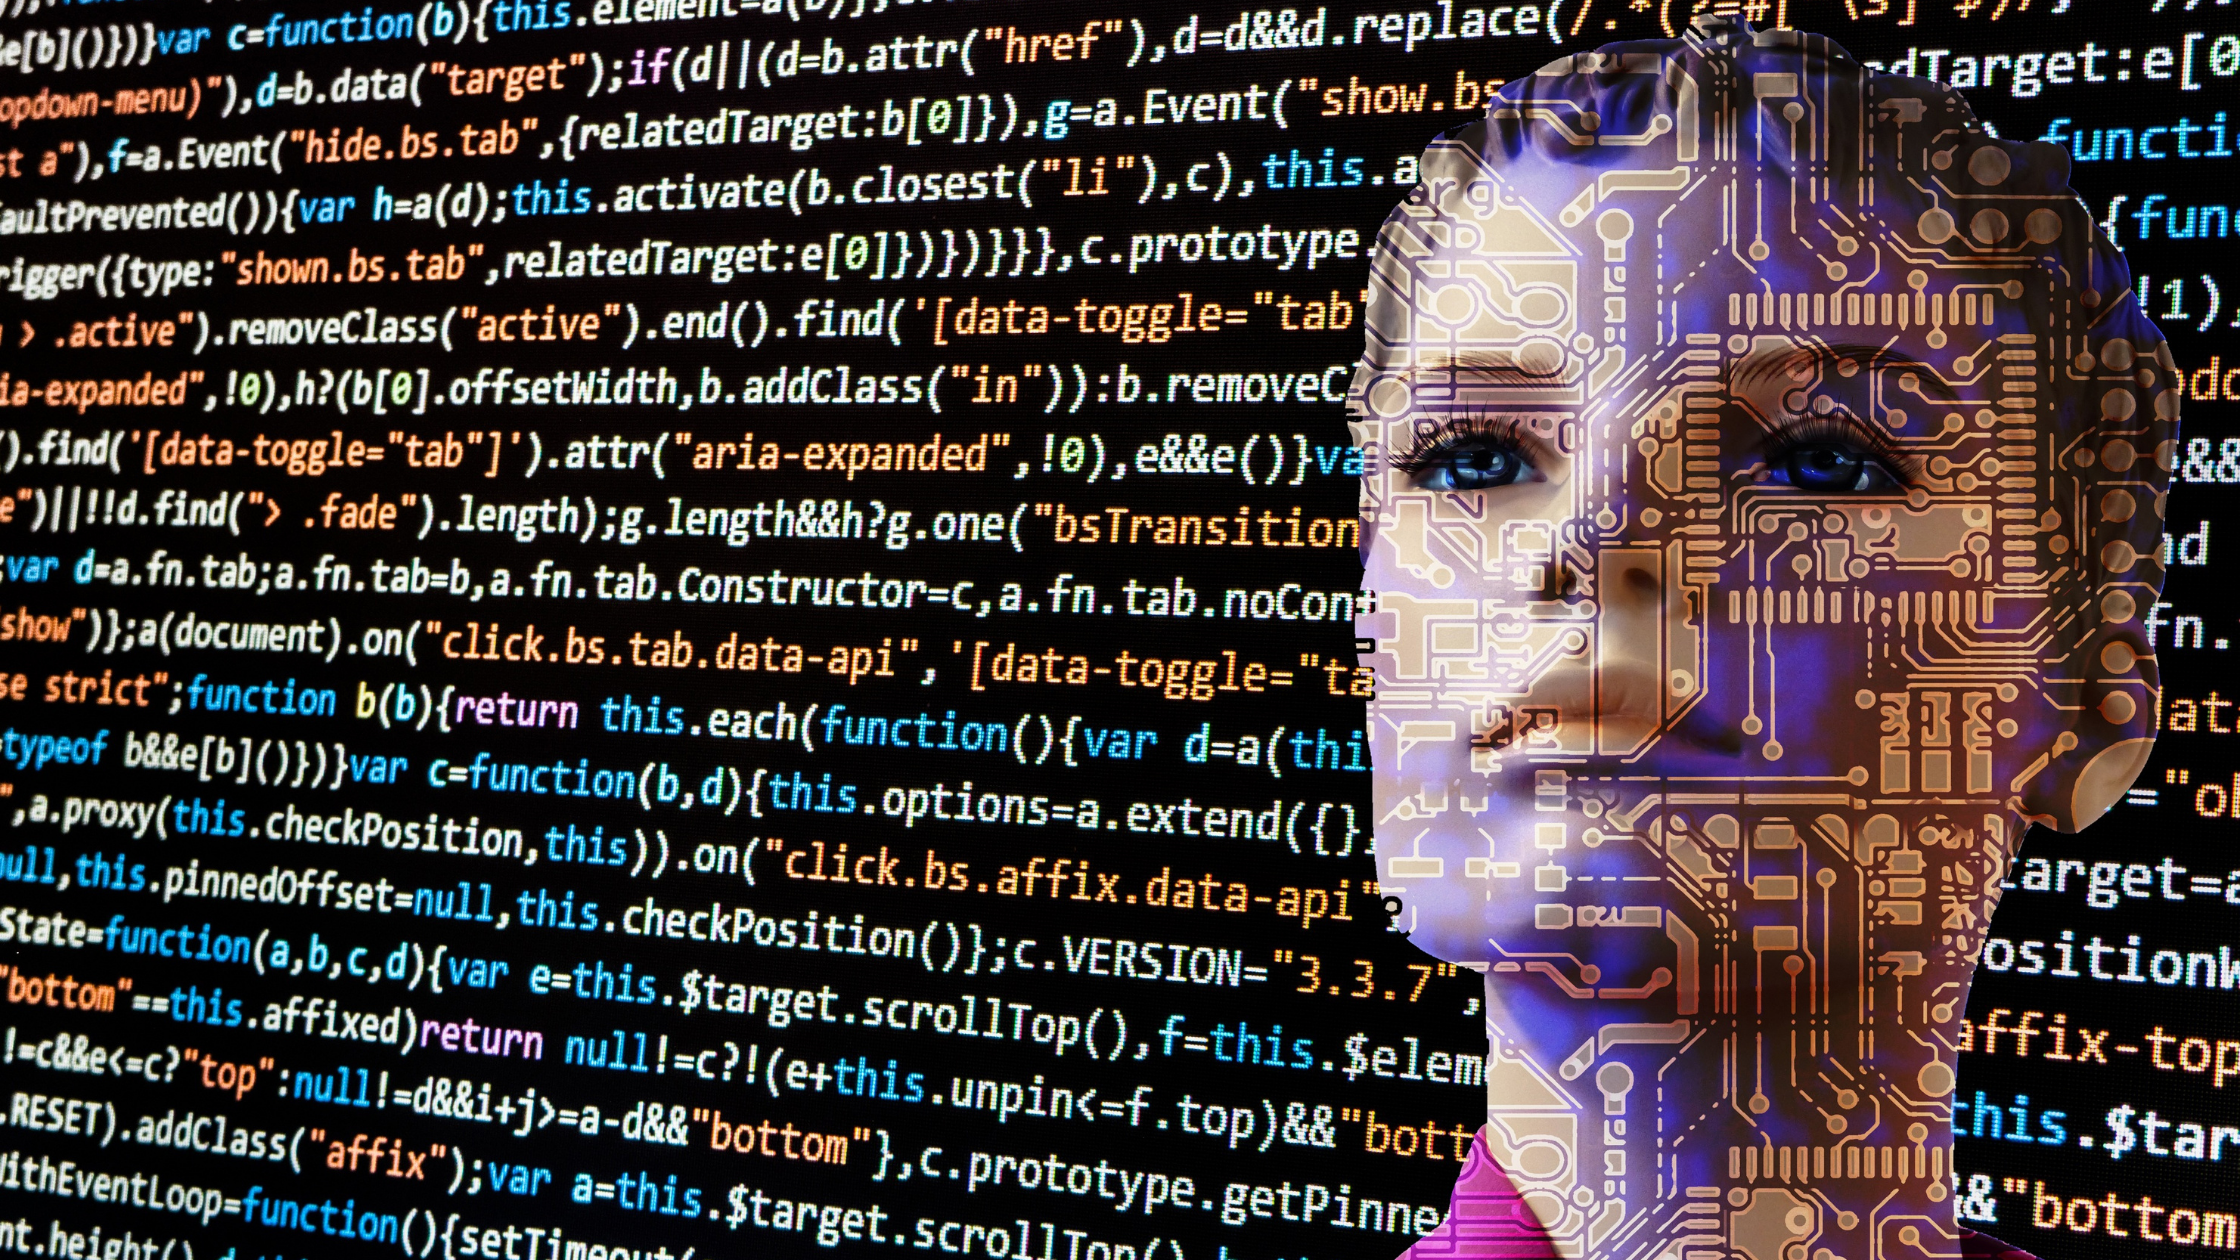 beleggen in artificiele intelligentie